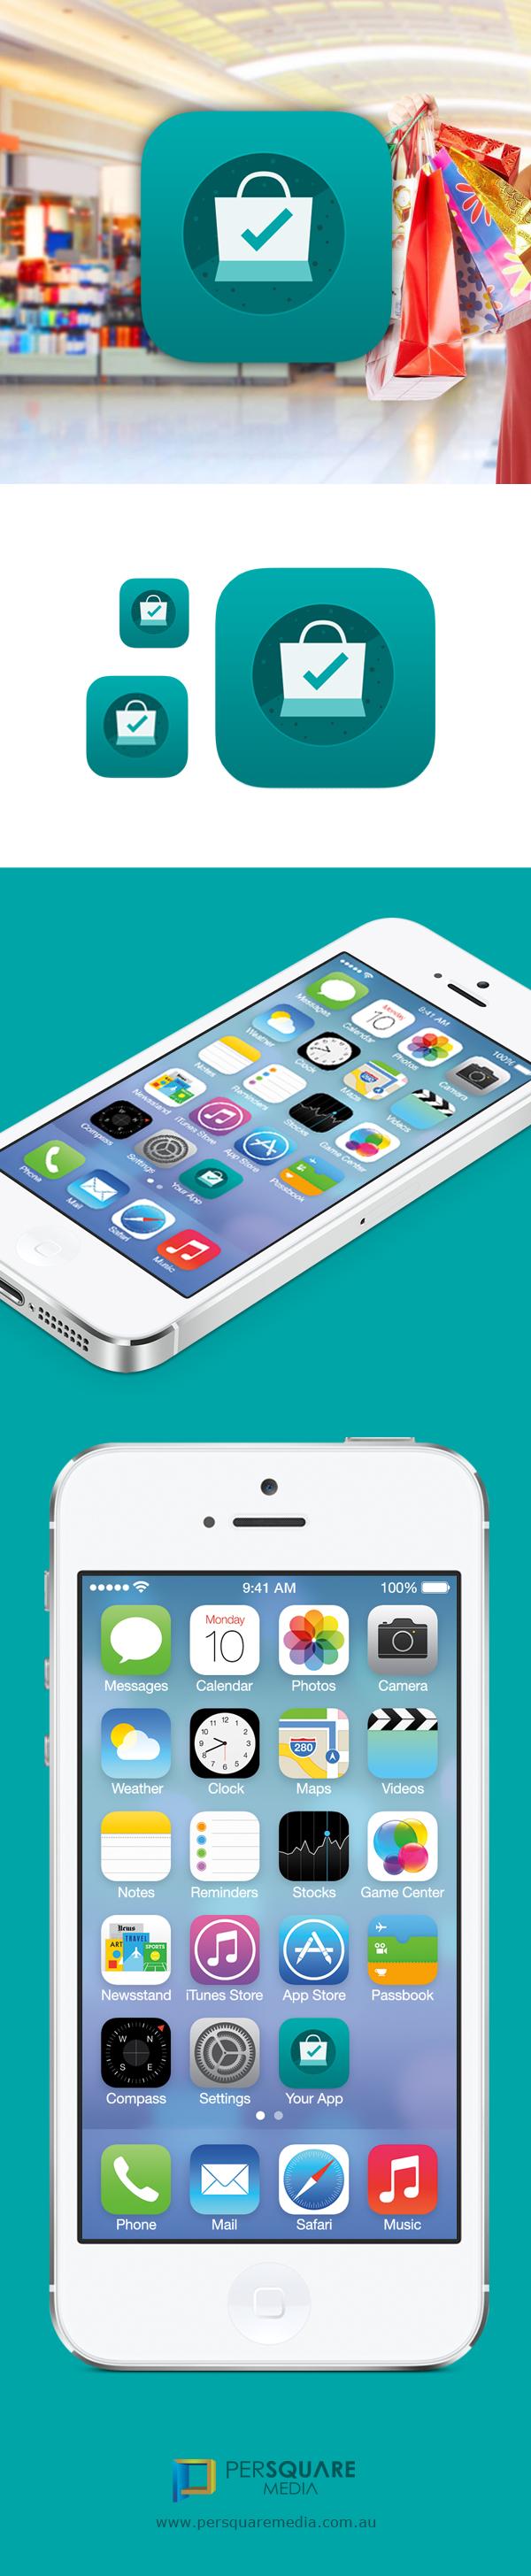 App Icon Design App icon design